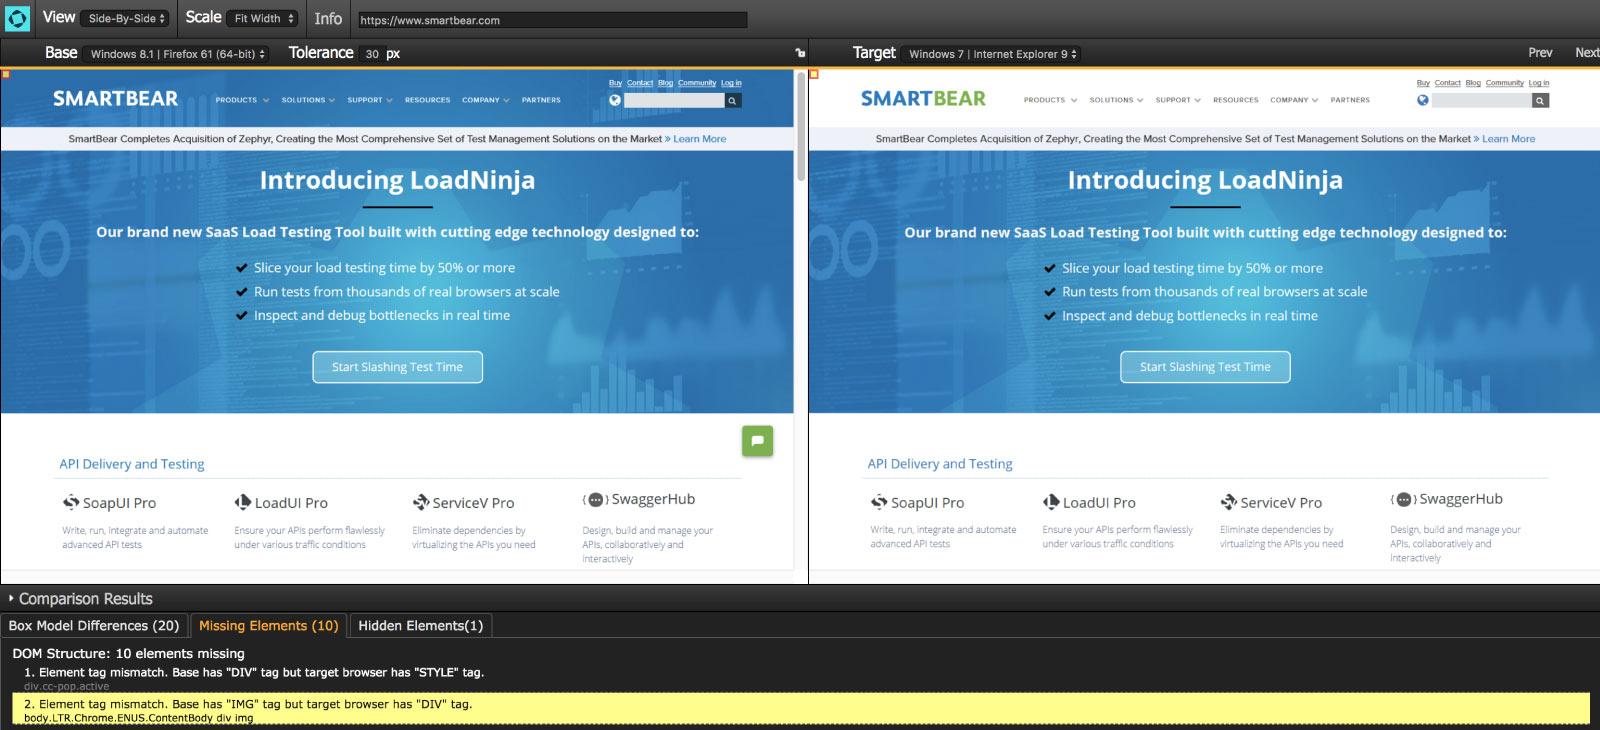 Cross Browser Testing Tool: 1500+ Mobile & Desktop Browsers